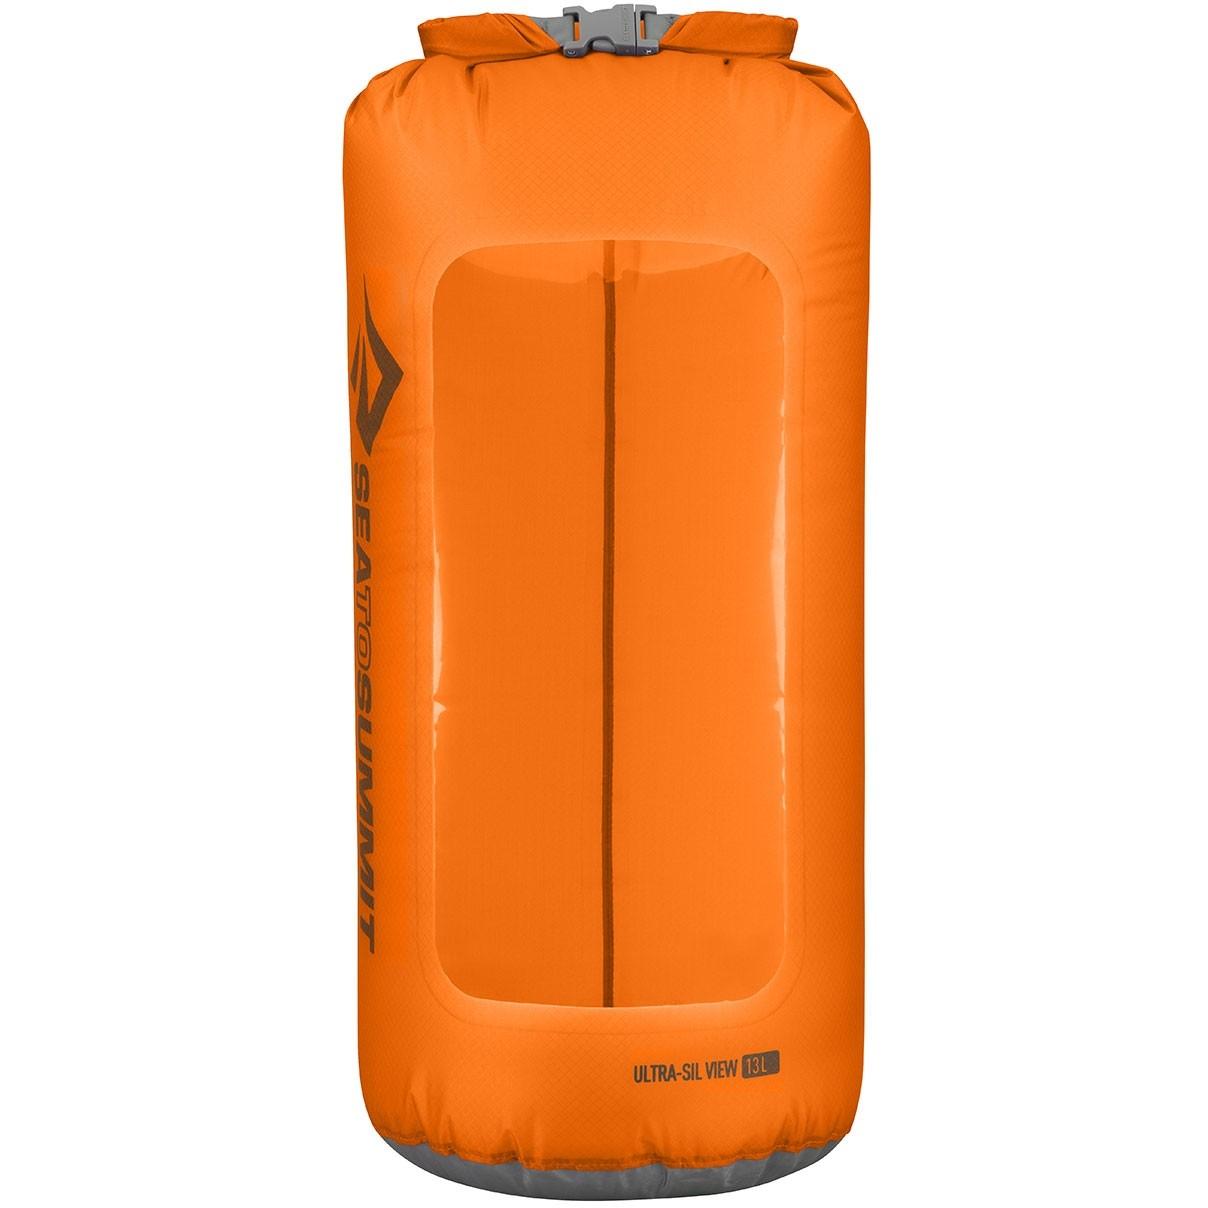 Sea to Summit Ultra-Sil View Dry Sack 13 Litre Orange